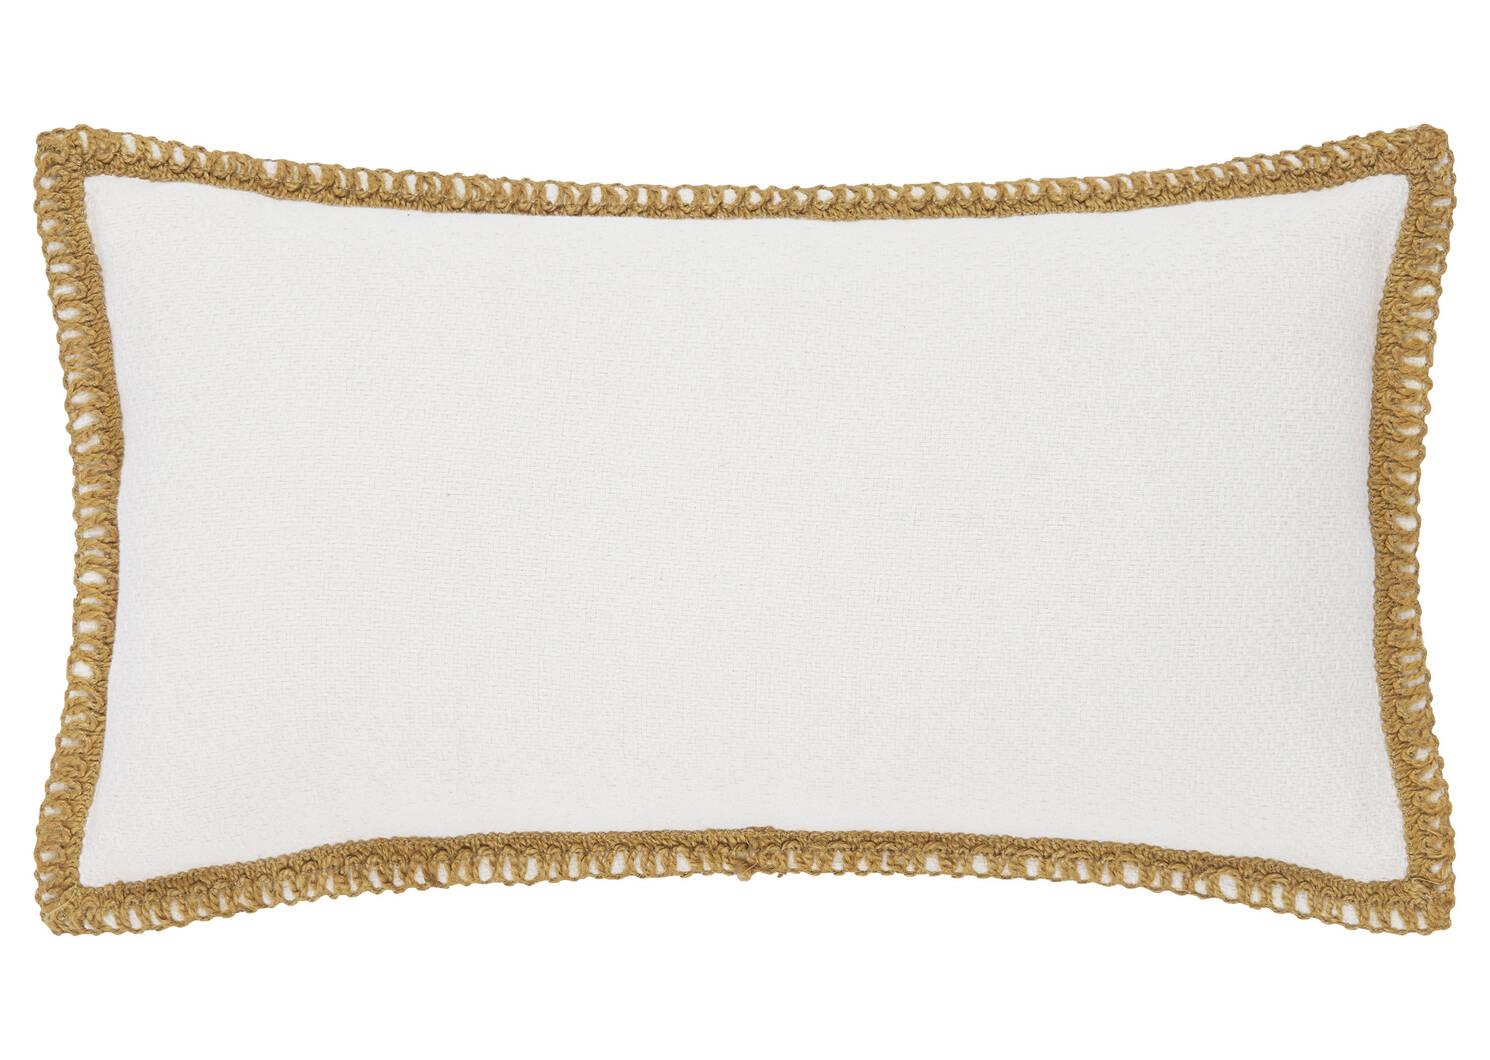 Veracruz Trim Toss 12x22 Ivory/Goldfi